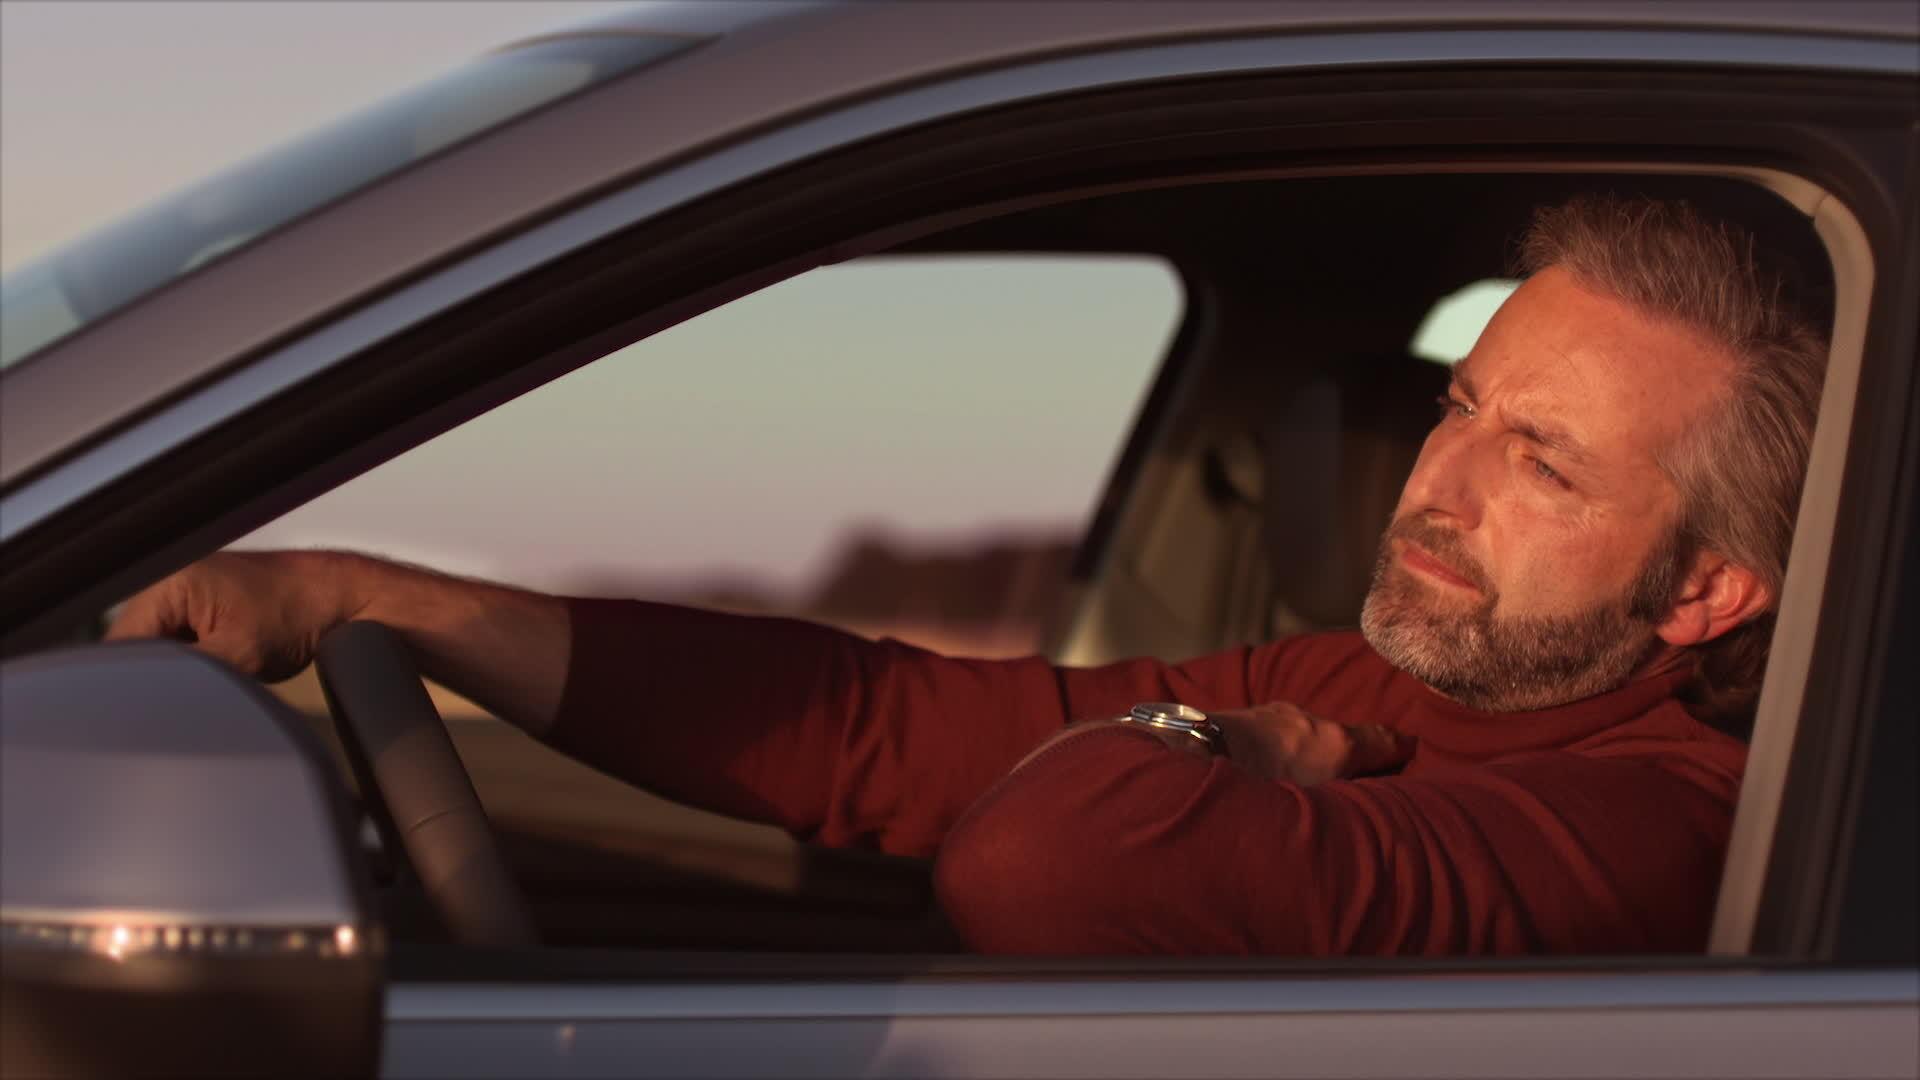 Das Soundsystem im neuen Audi Q5